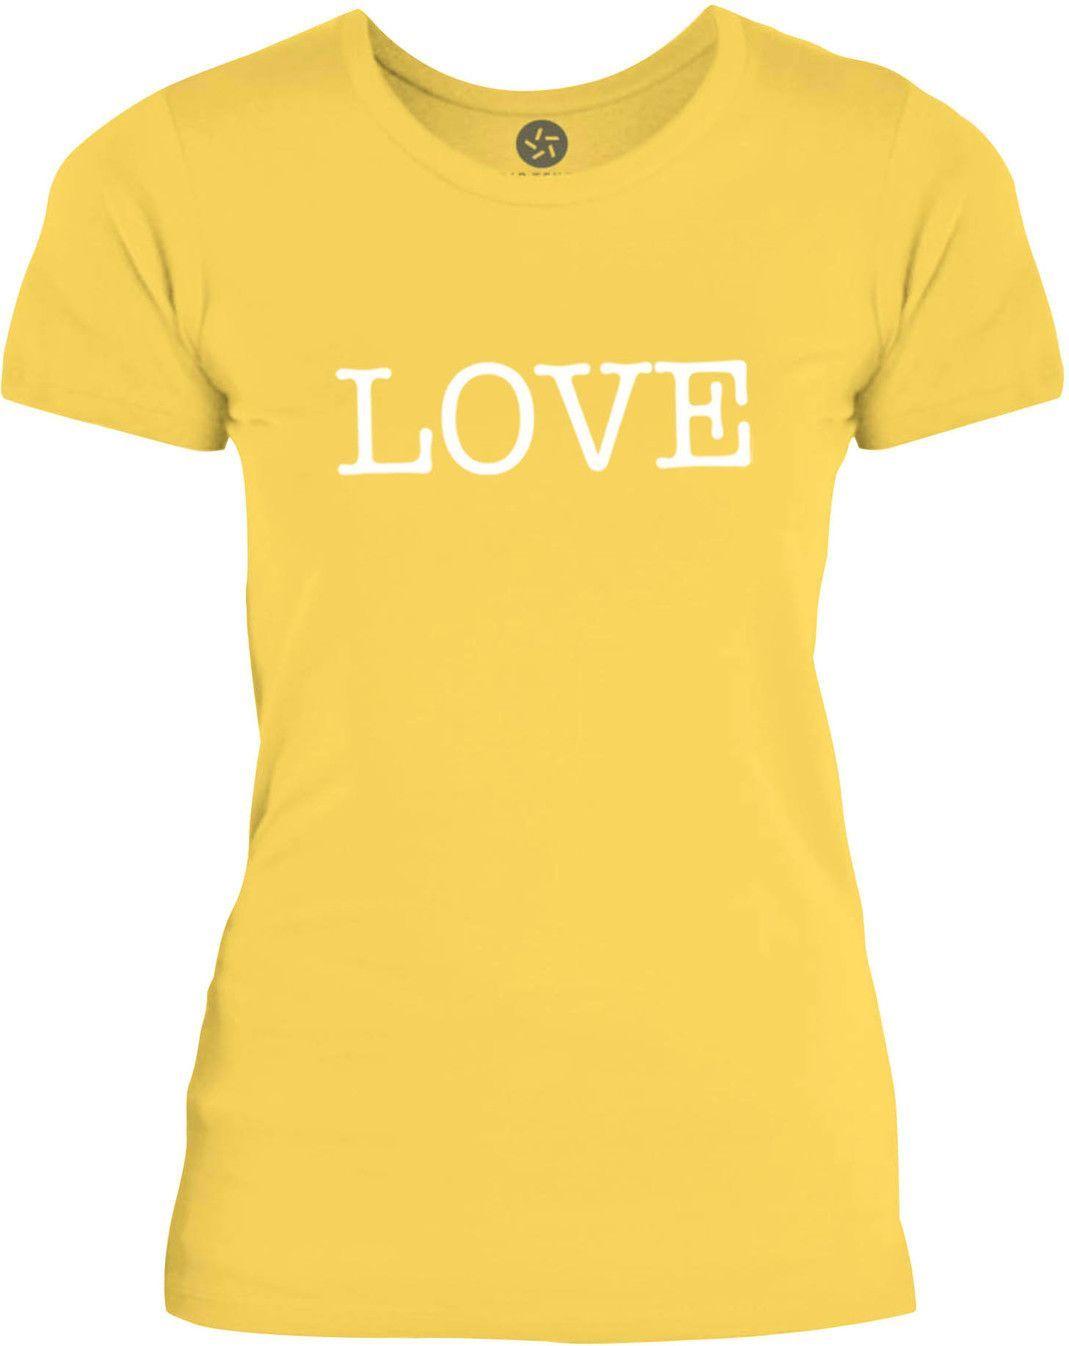 Big Texas LOVE (White) Womens Fine Jersey T-Shirt